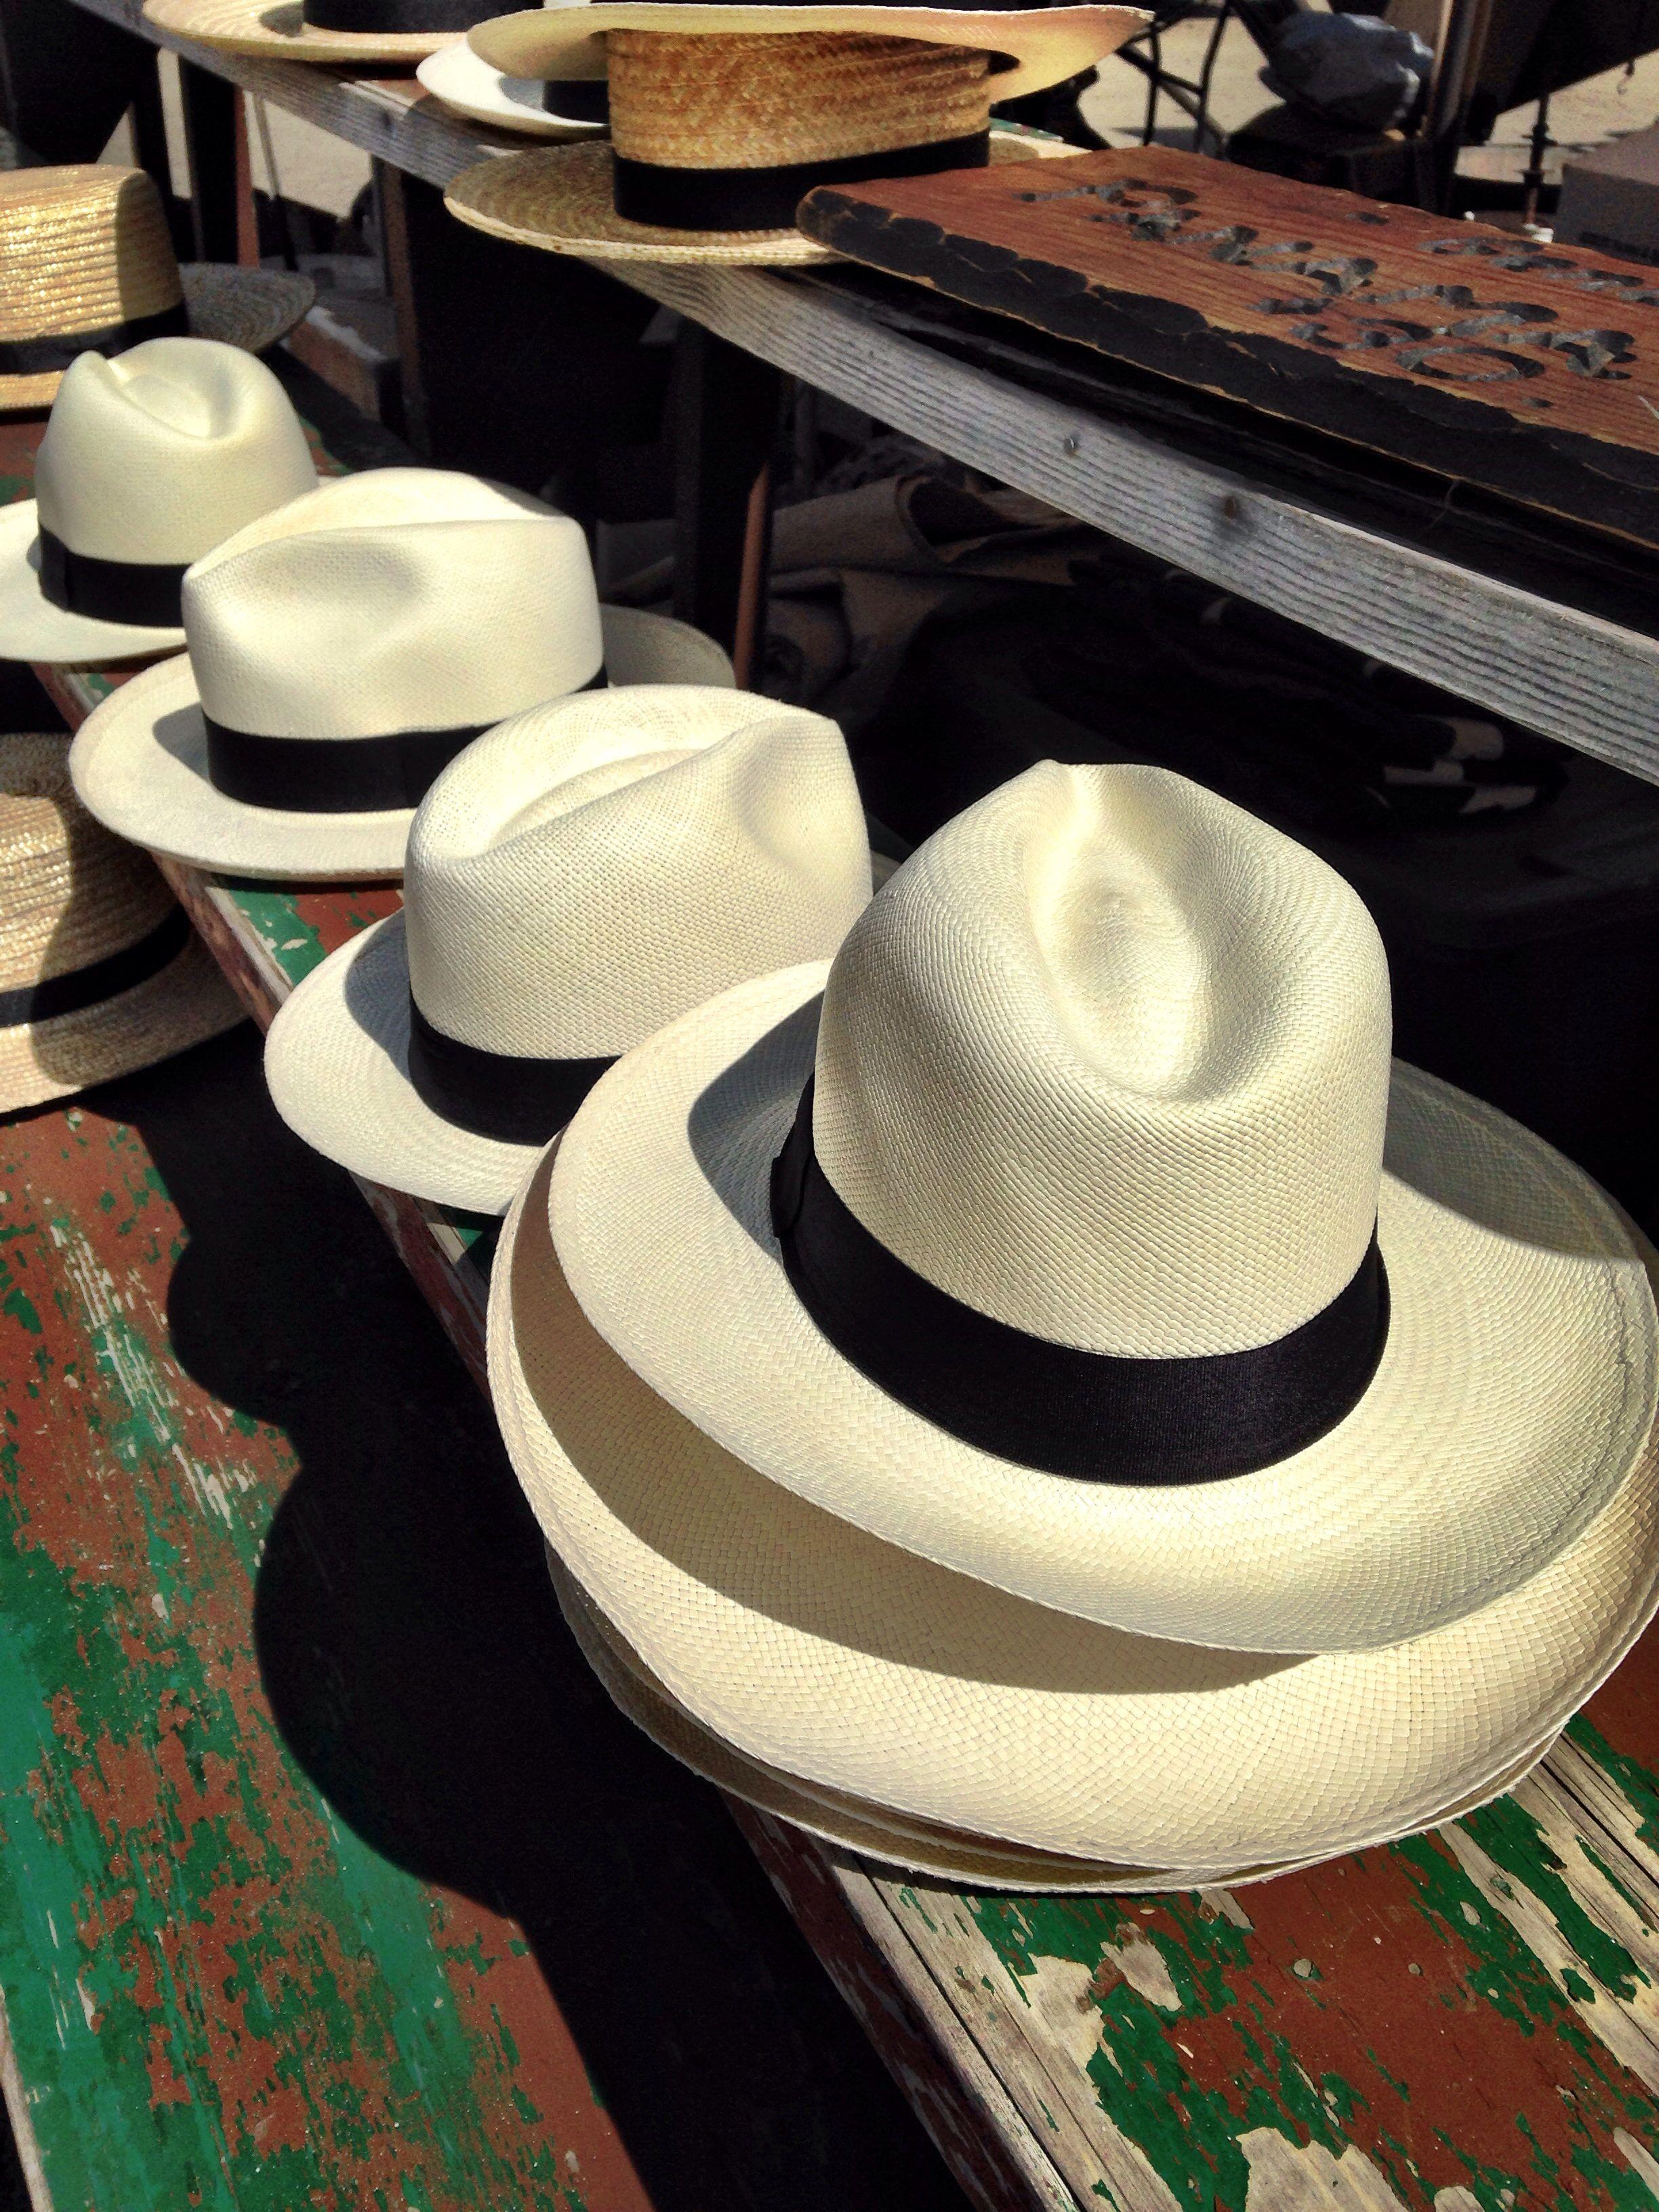 ac98073f69c8c Tennis - Grab your Roland Garros Panama Hat...The French Open 2014 is  underway in Paris!